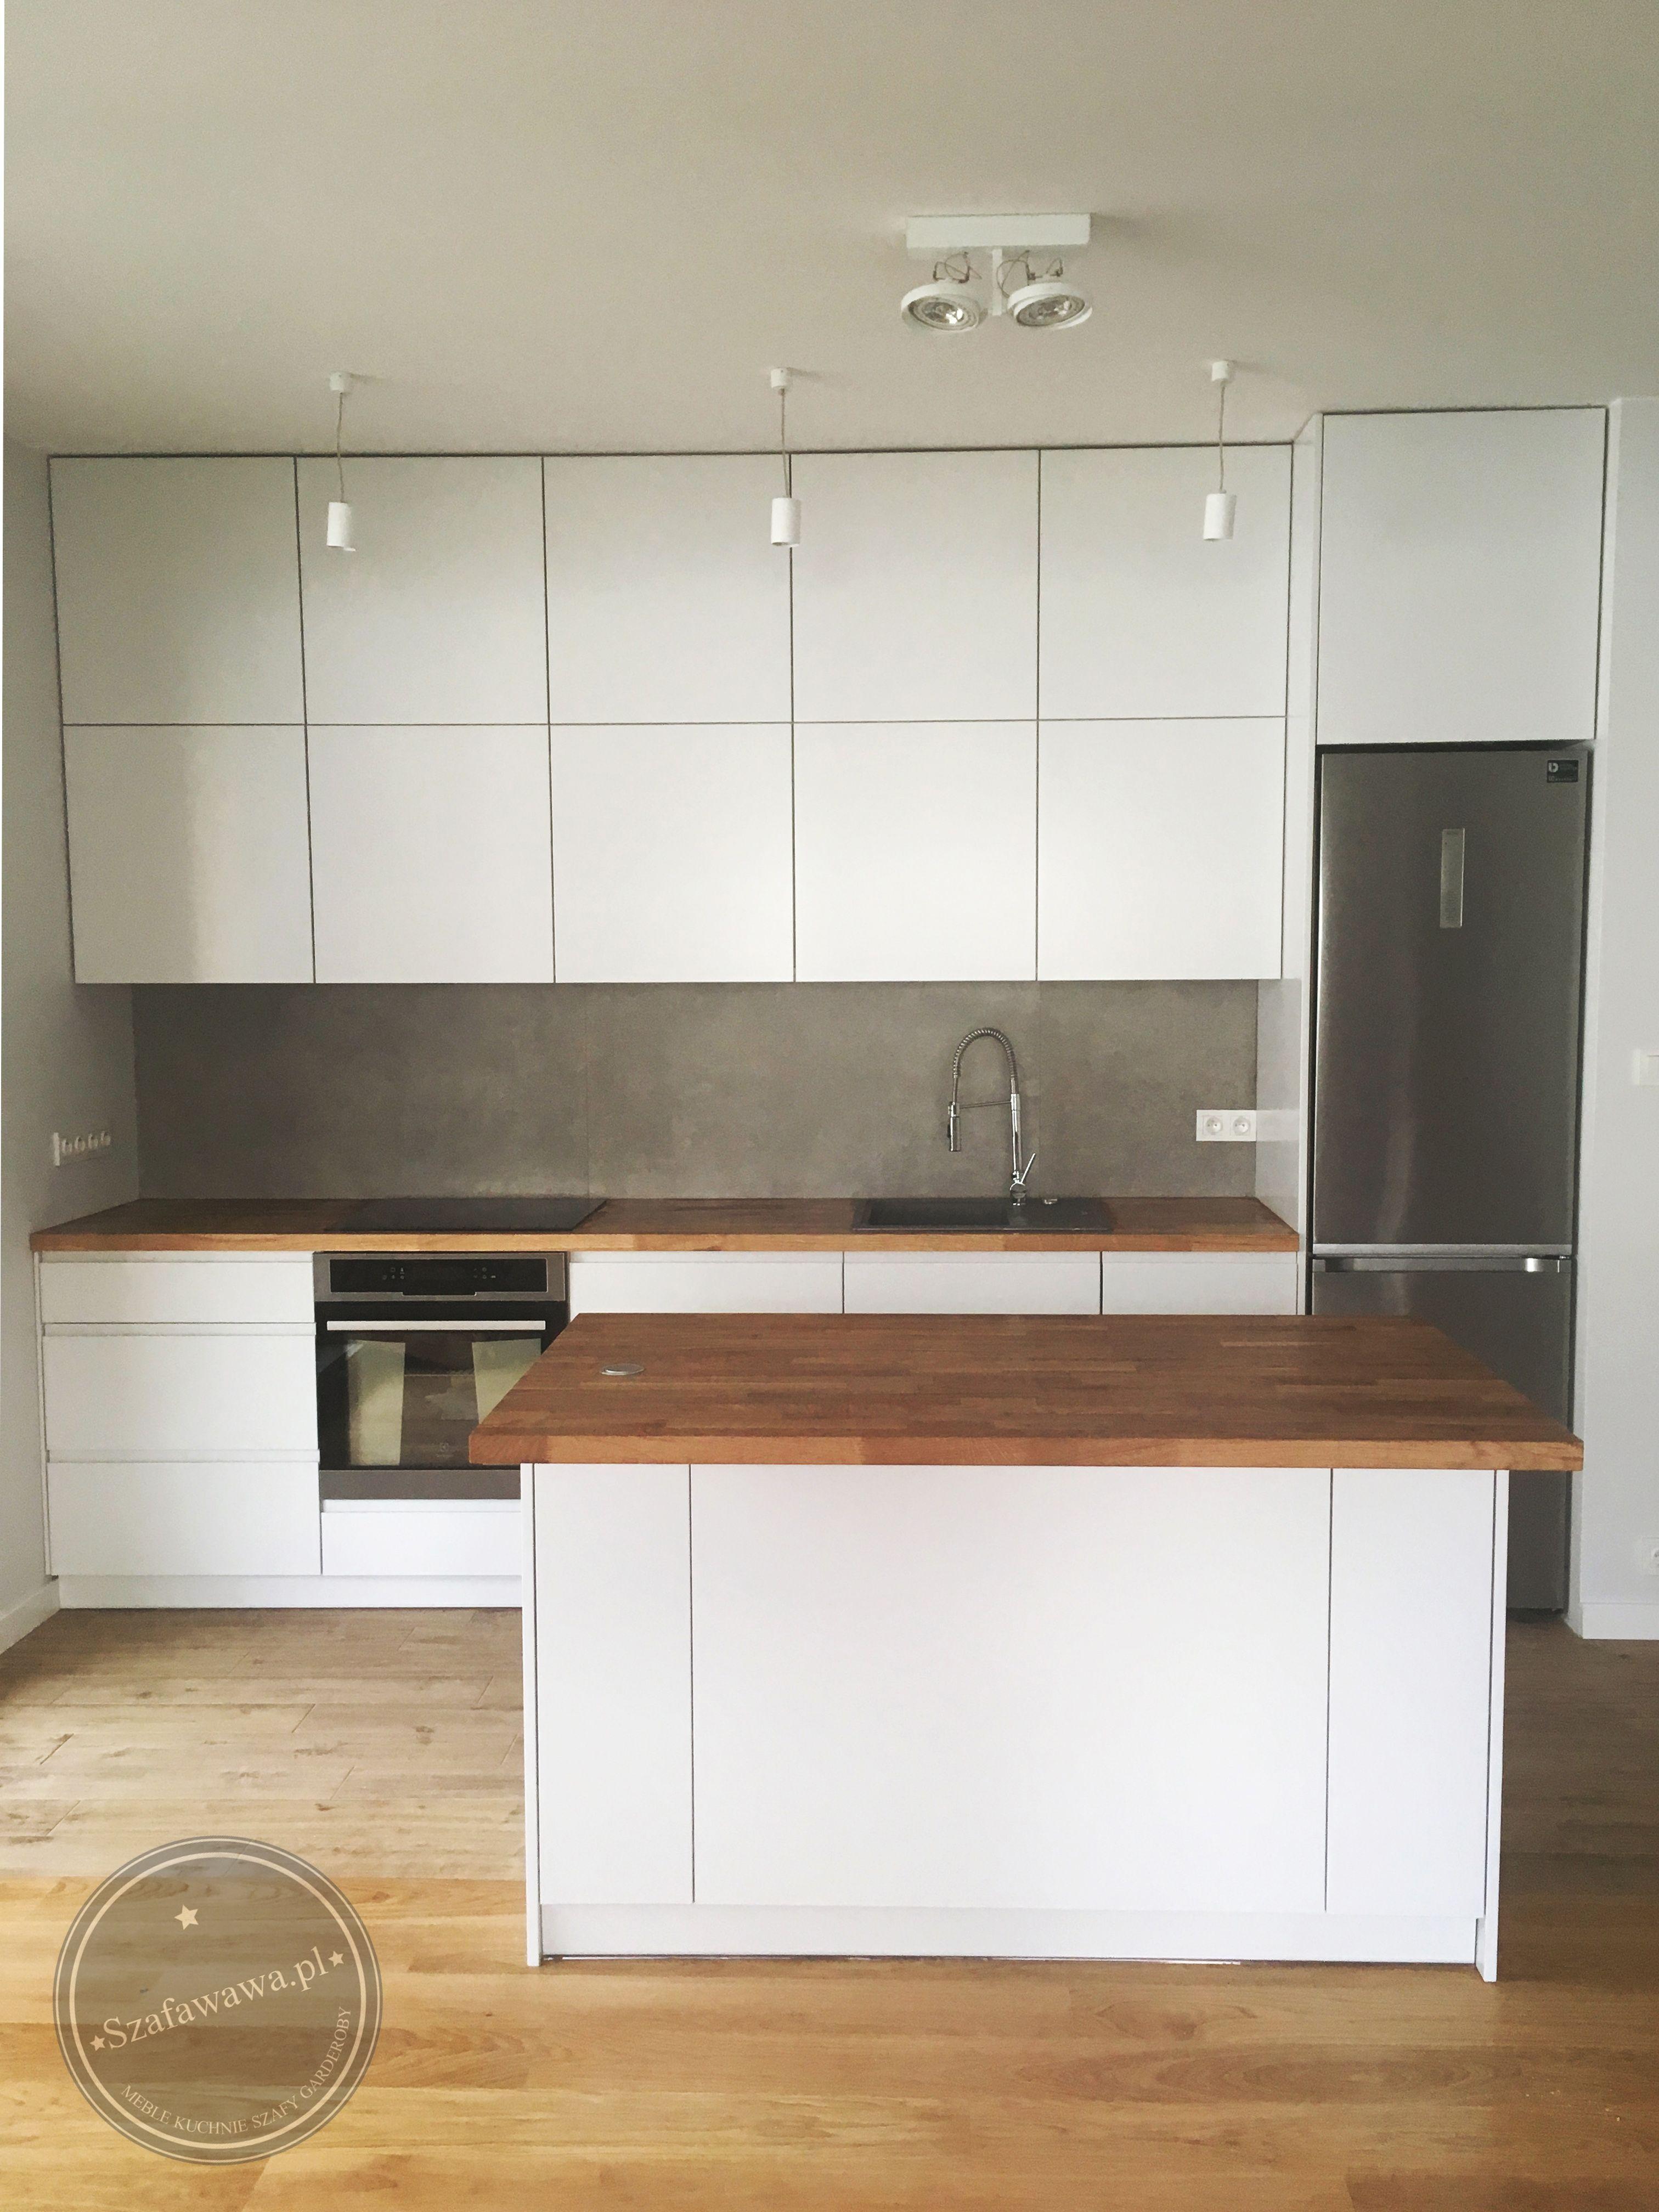 Kuchnia Na Wymiar Z Frezowanymi Uchwytami Szafawawa Kitchen Design Small Kitchen Design Kitchen Furniture Design